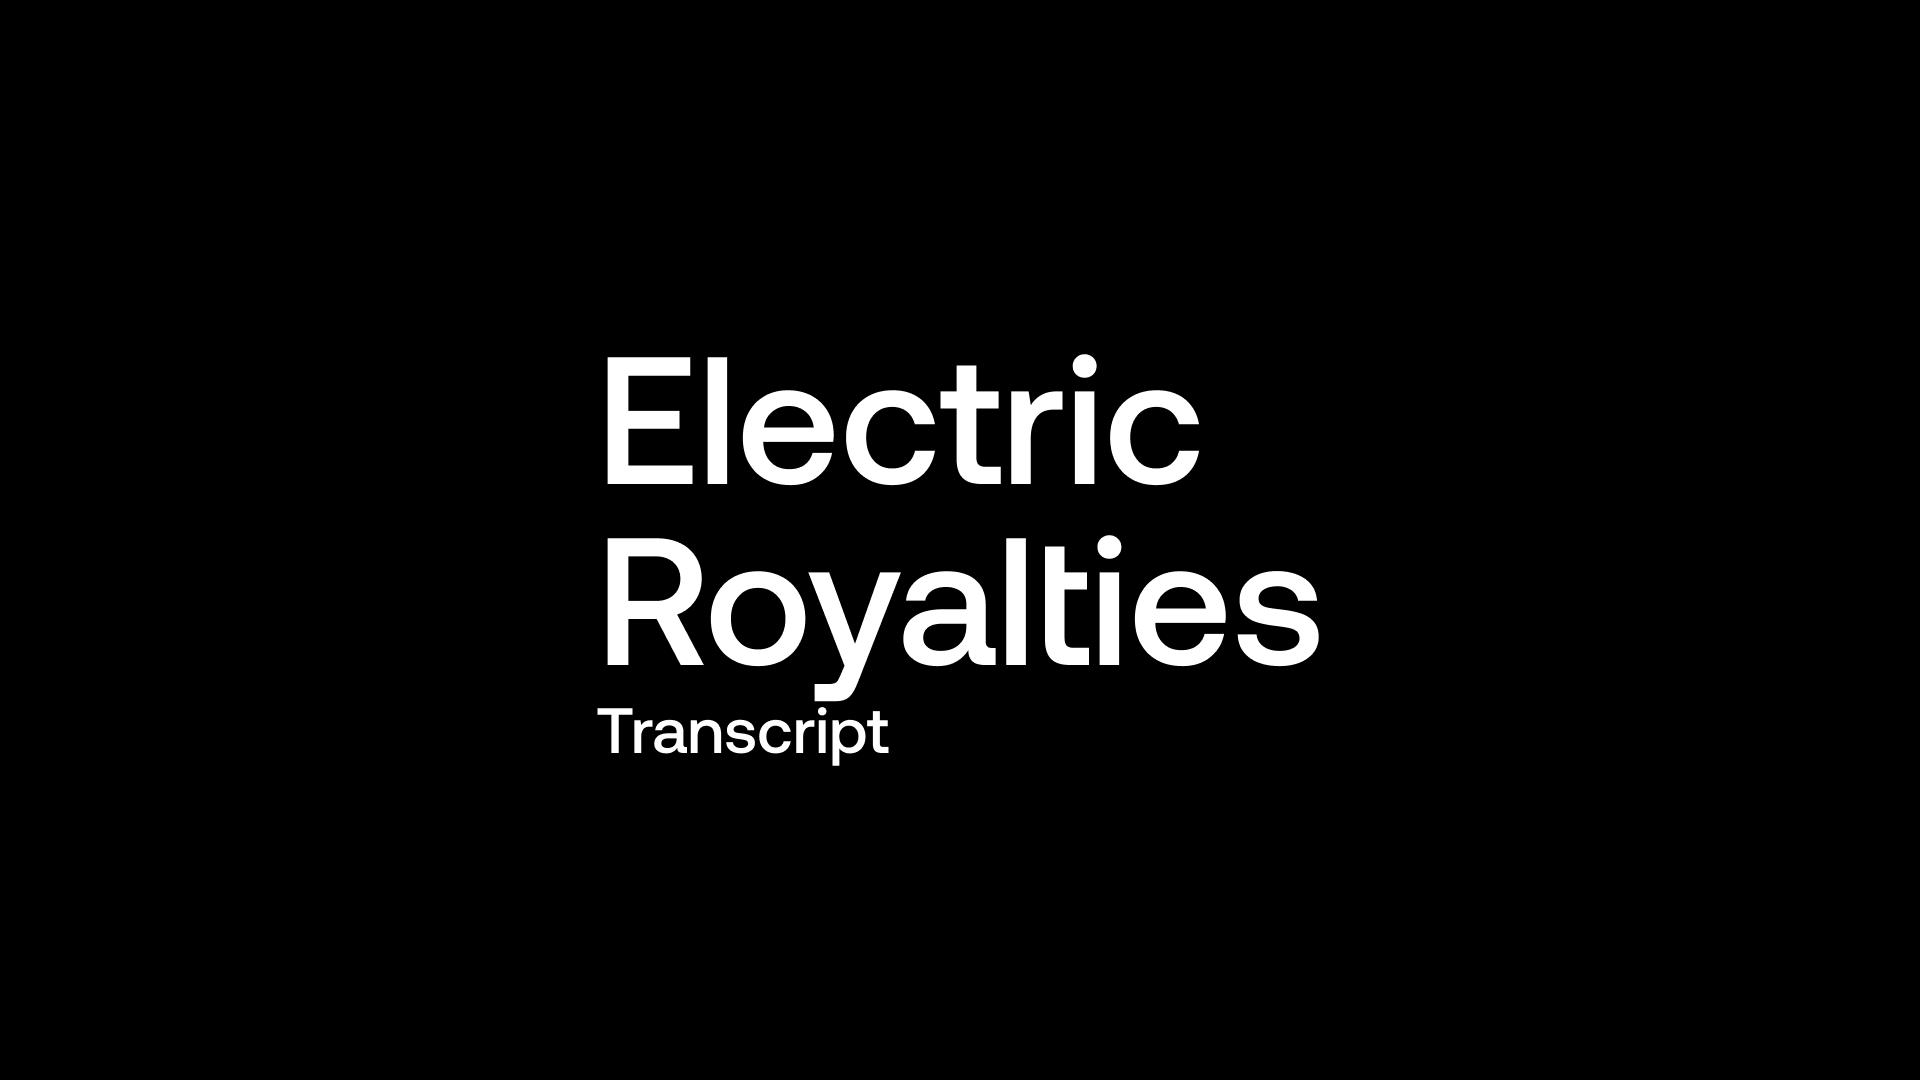 Transcript: Battery Metals - Electric Royalties (ELEC) - Revenue Guidance for 2022